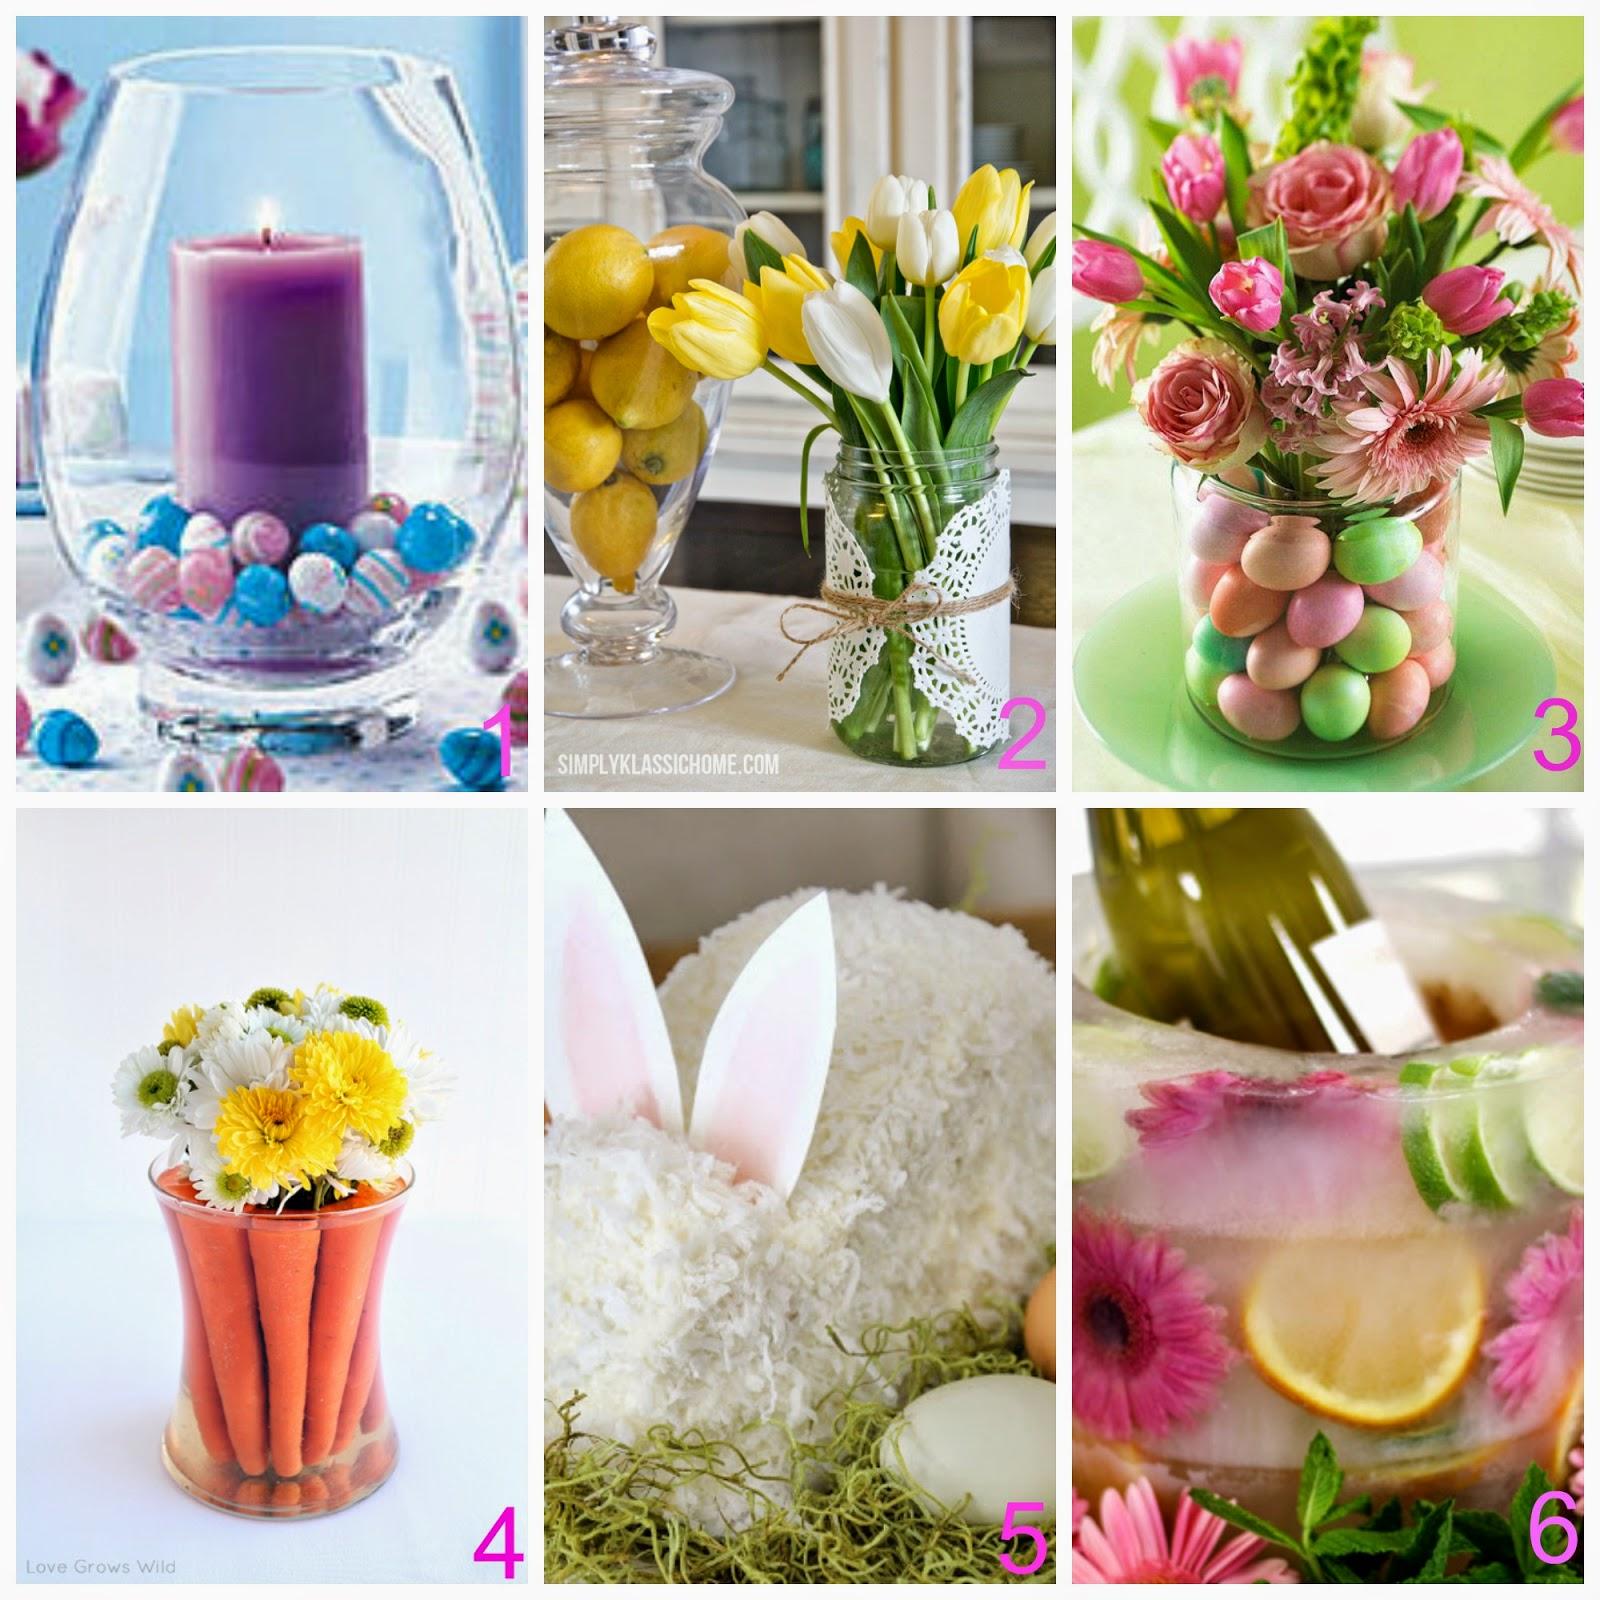 Top Centrotavola fai da te per Pasqua | donneinpink magazine VU47